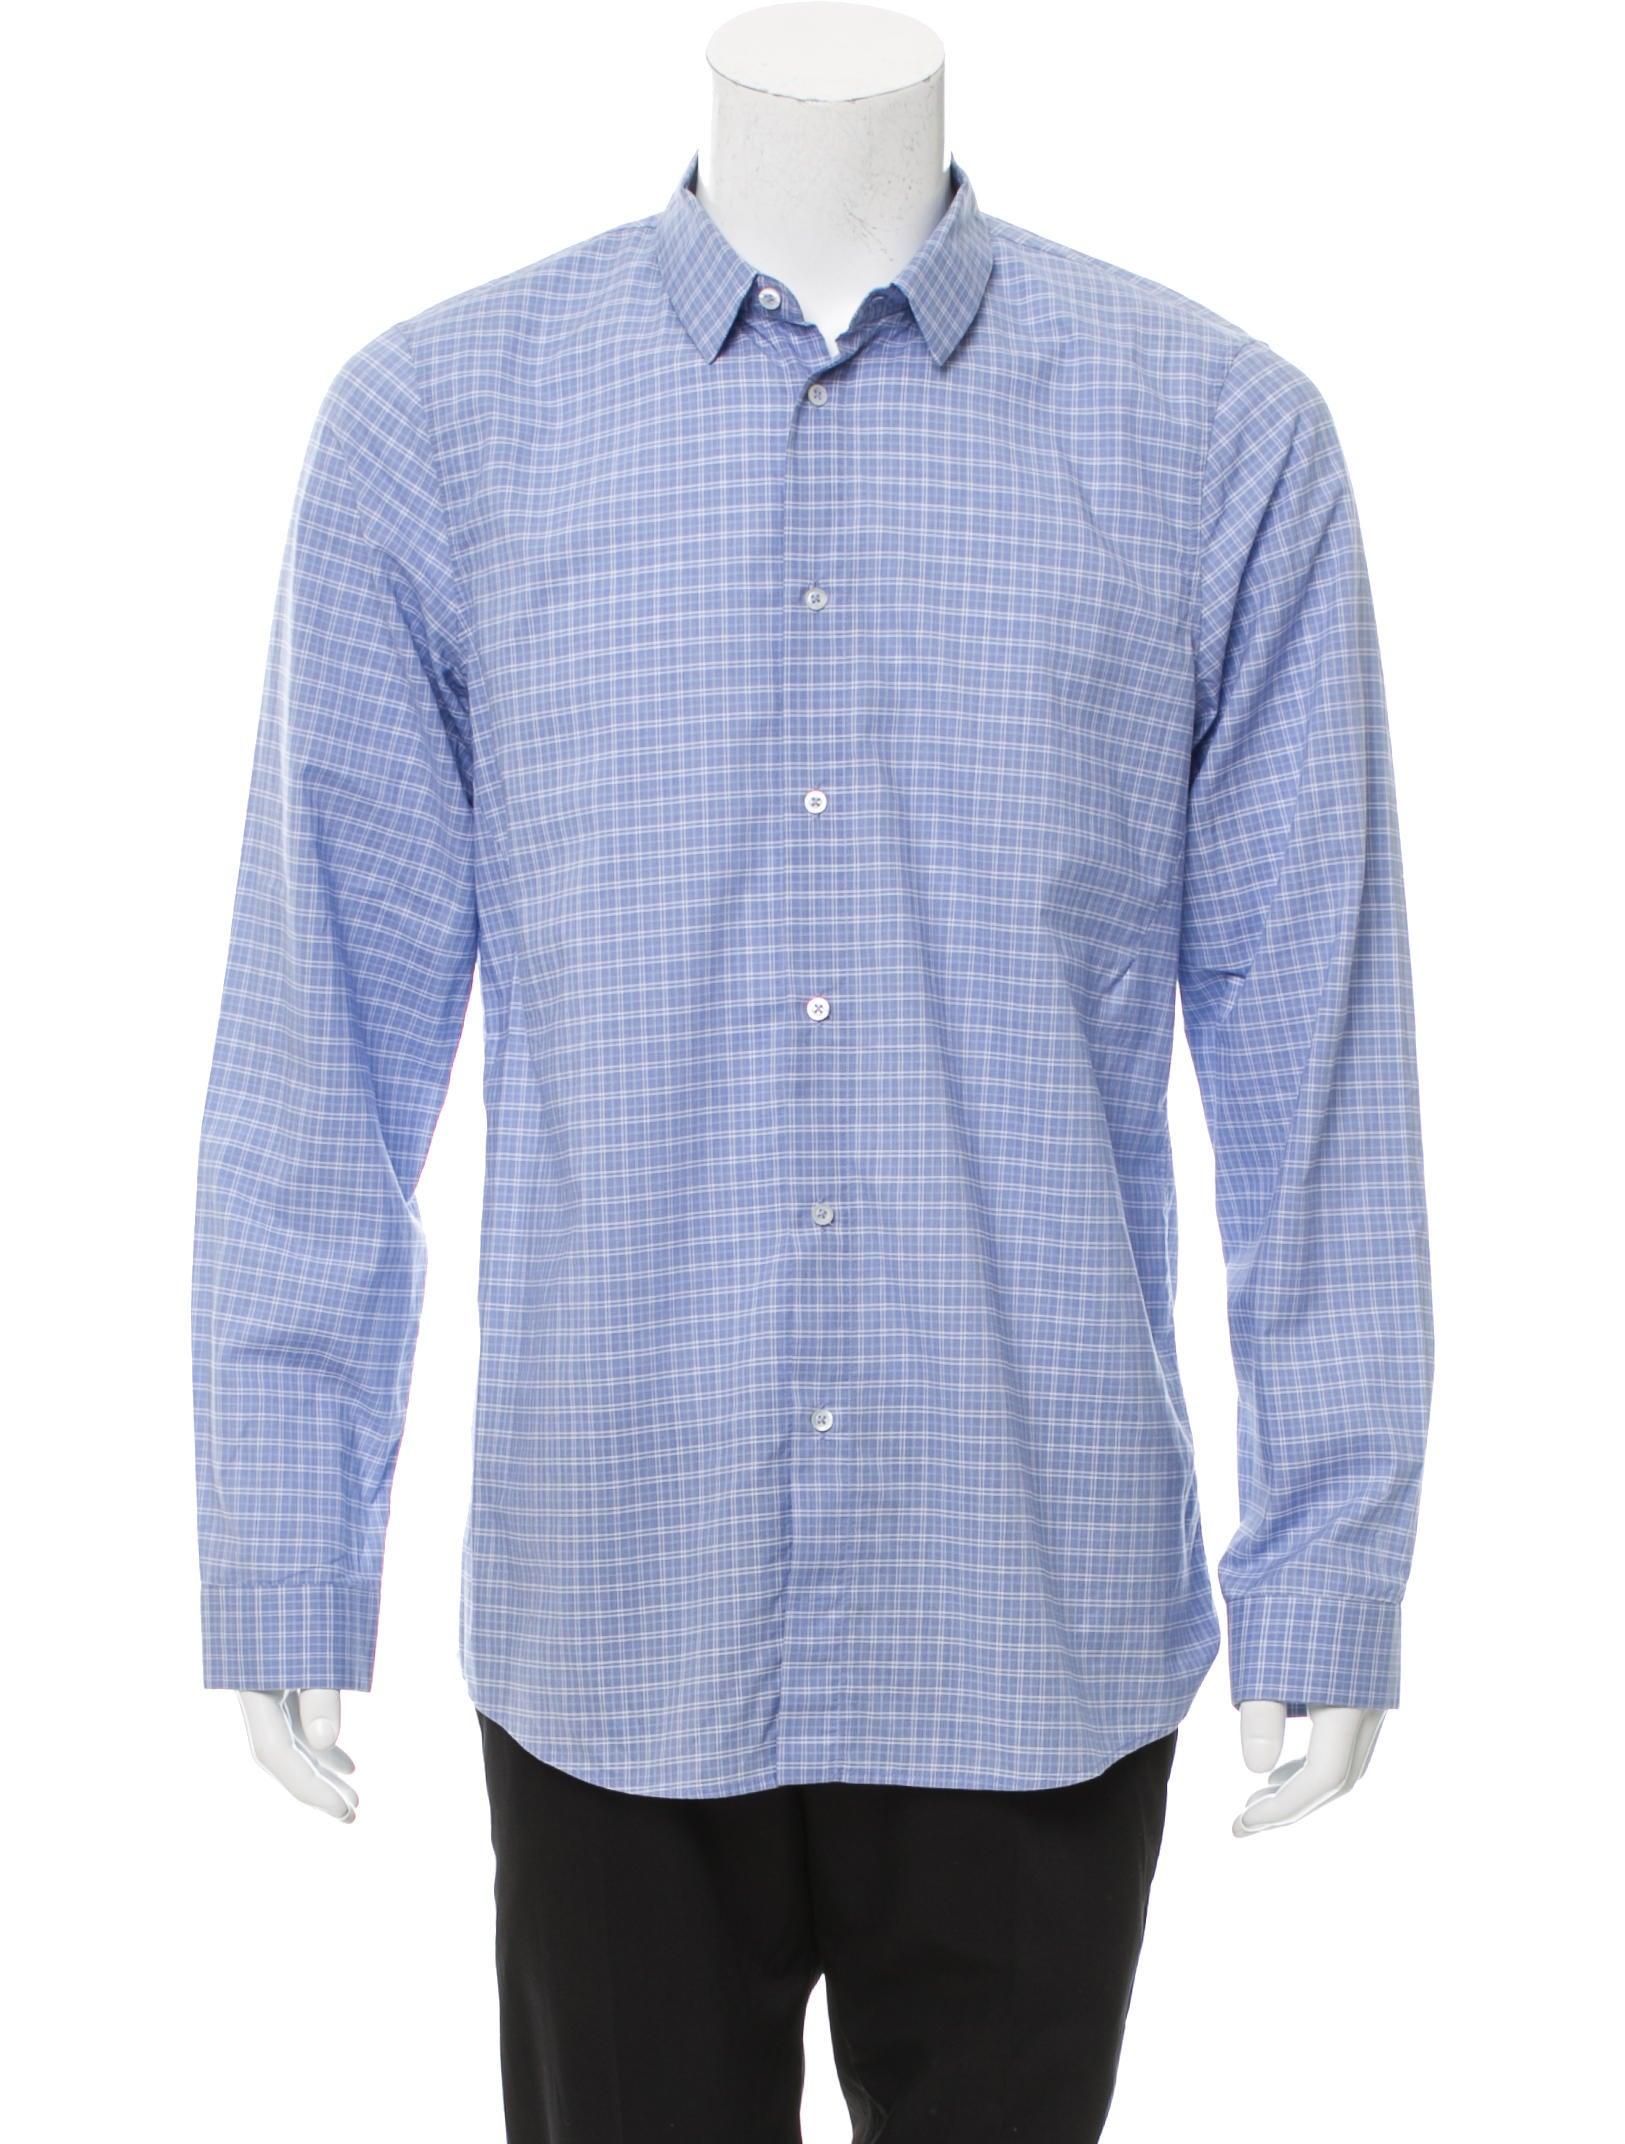 Jil sander plaid button up shirt clothing jil36724 for Jil sander mens shirt